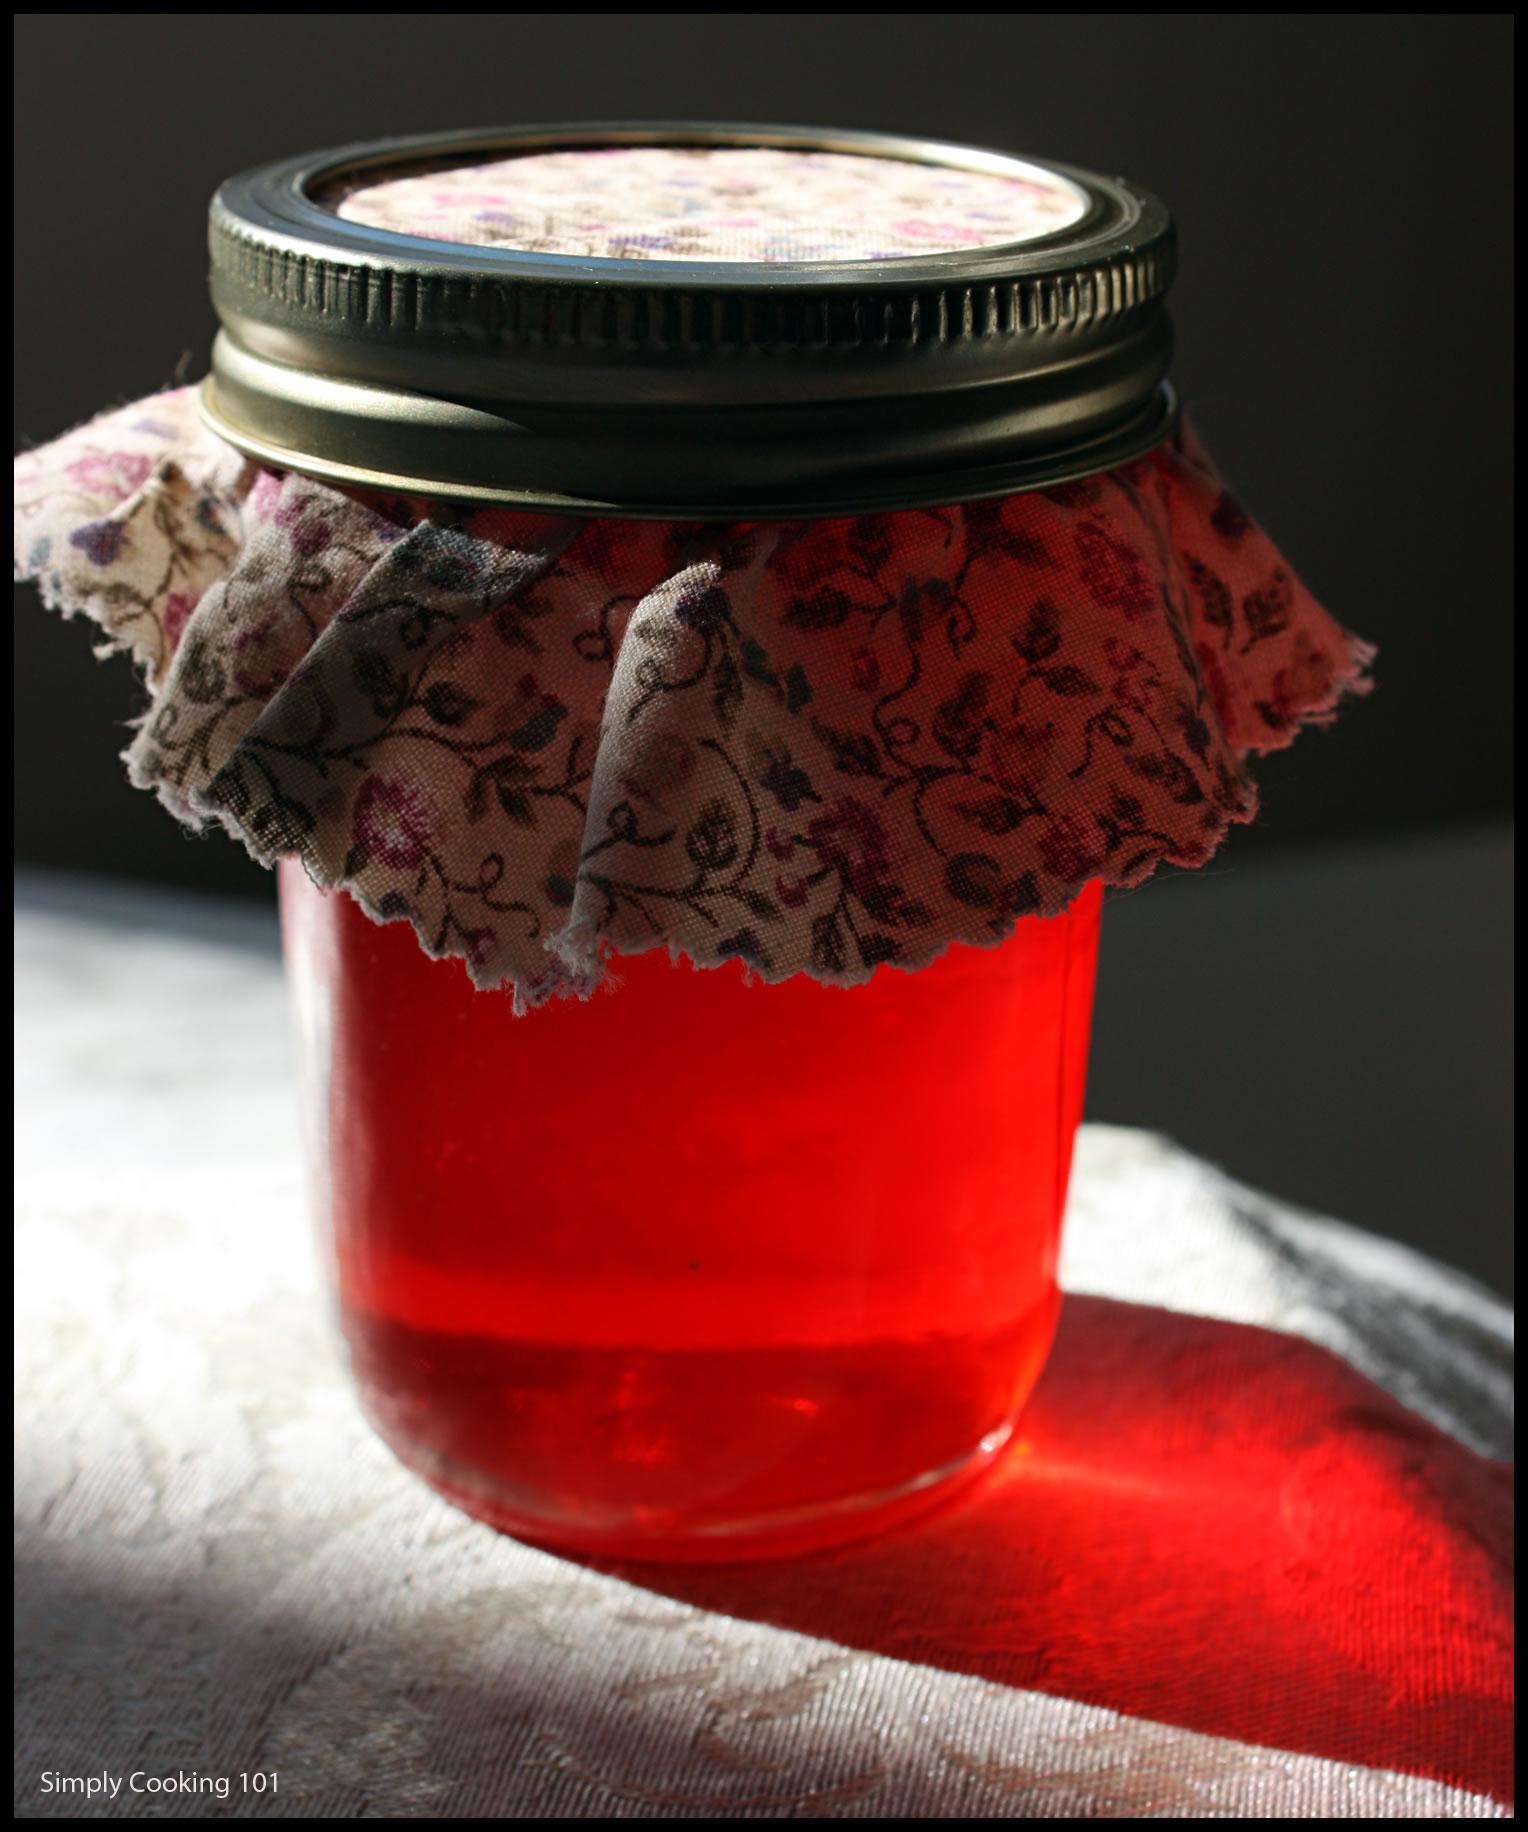 Maraschino Jelly makes everything better